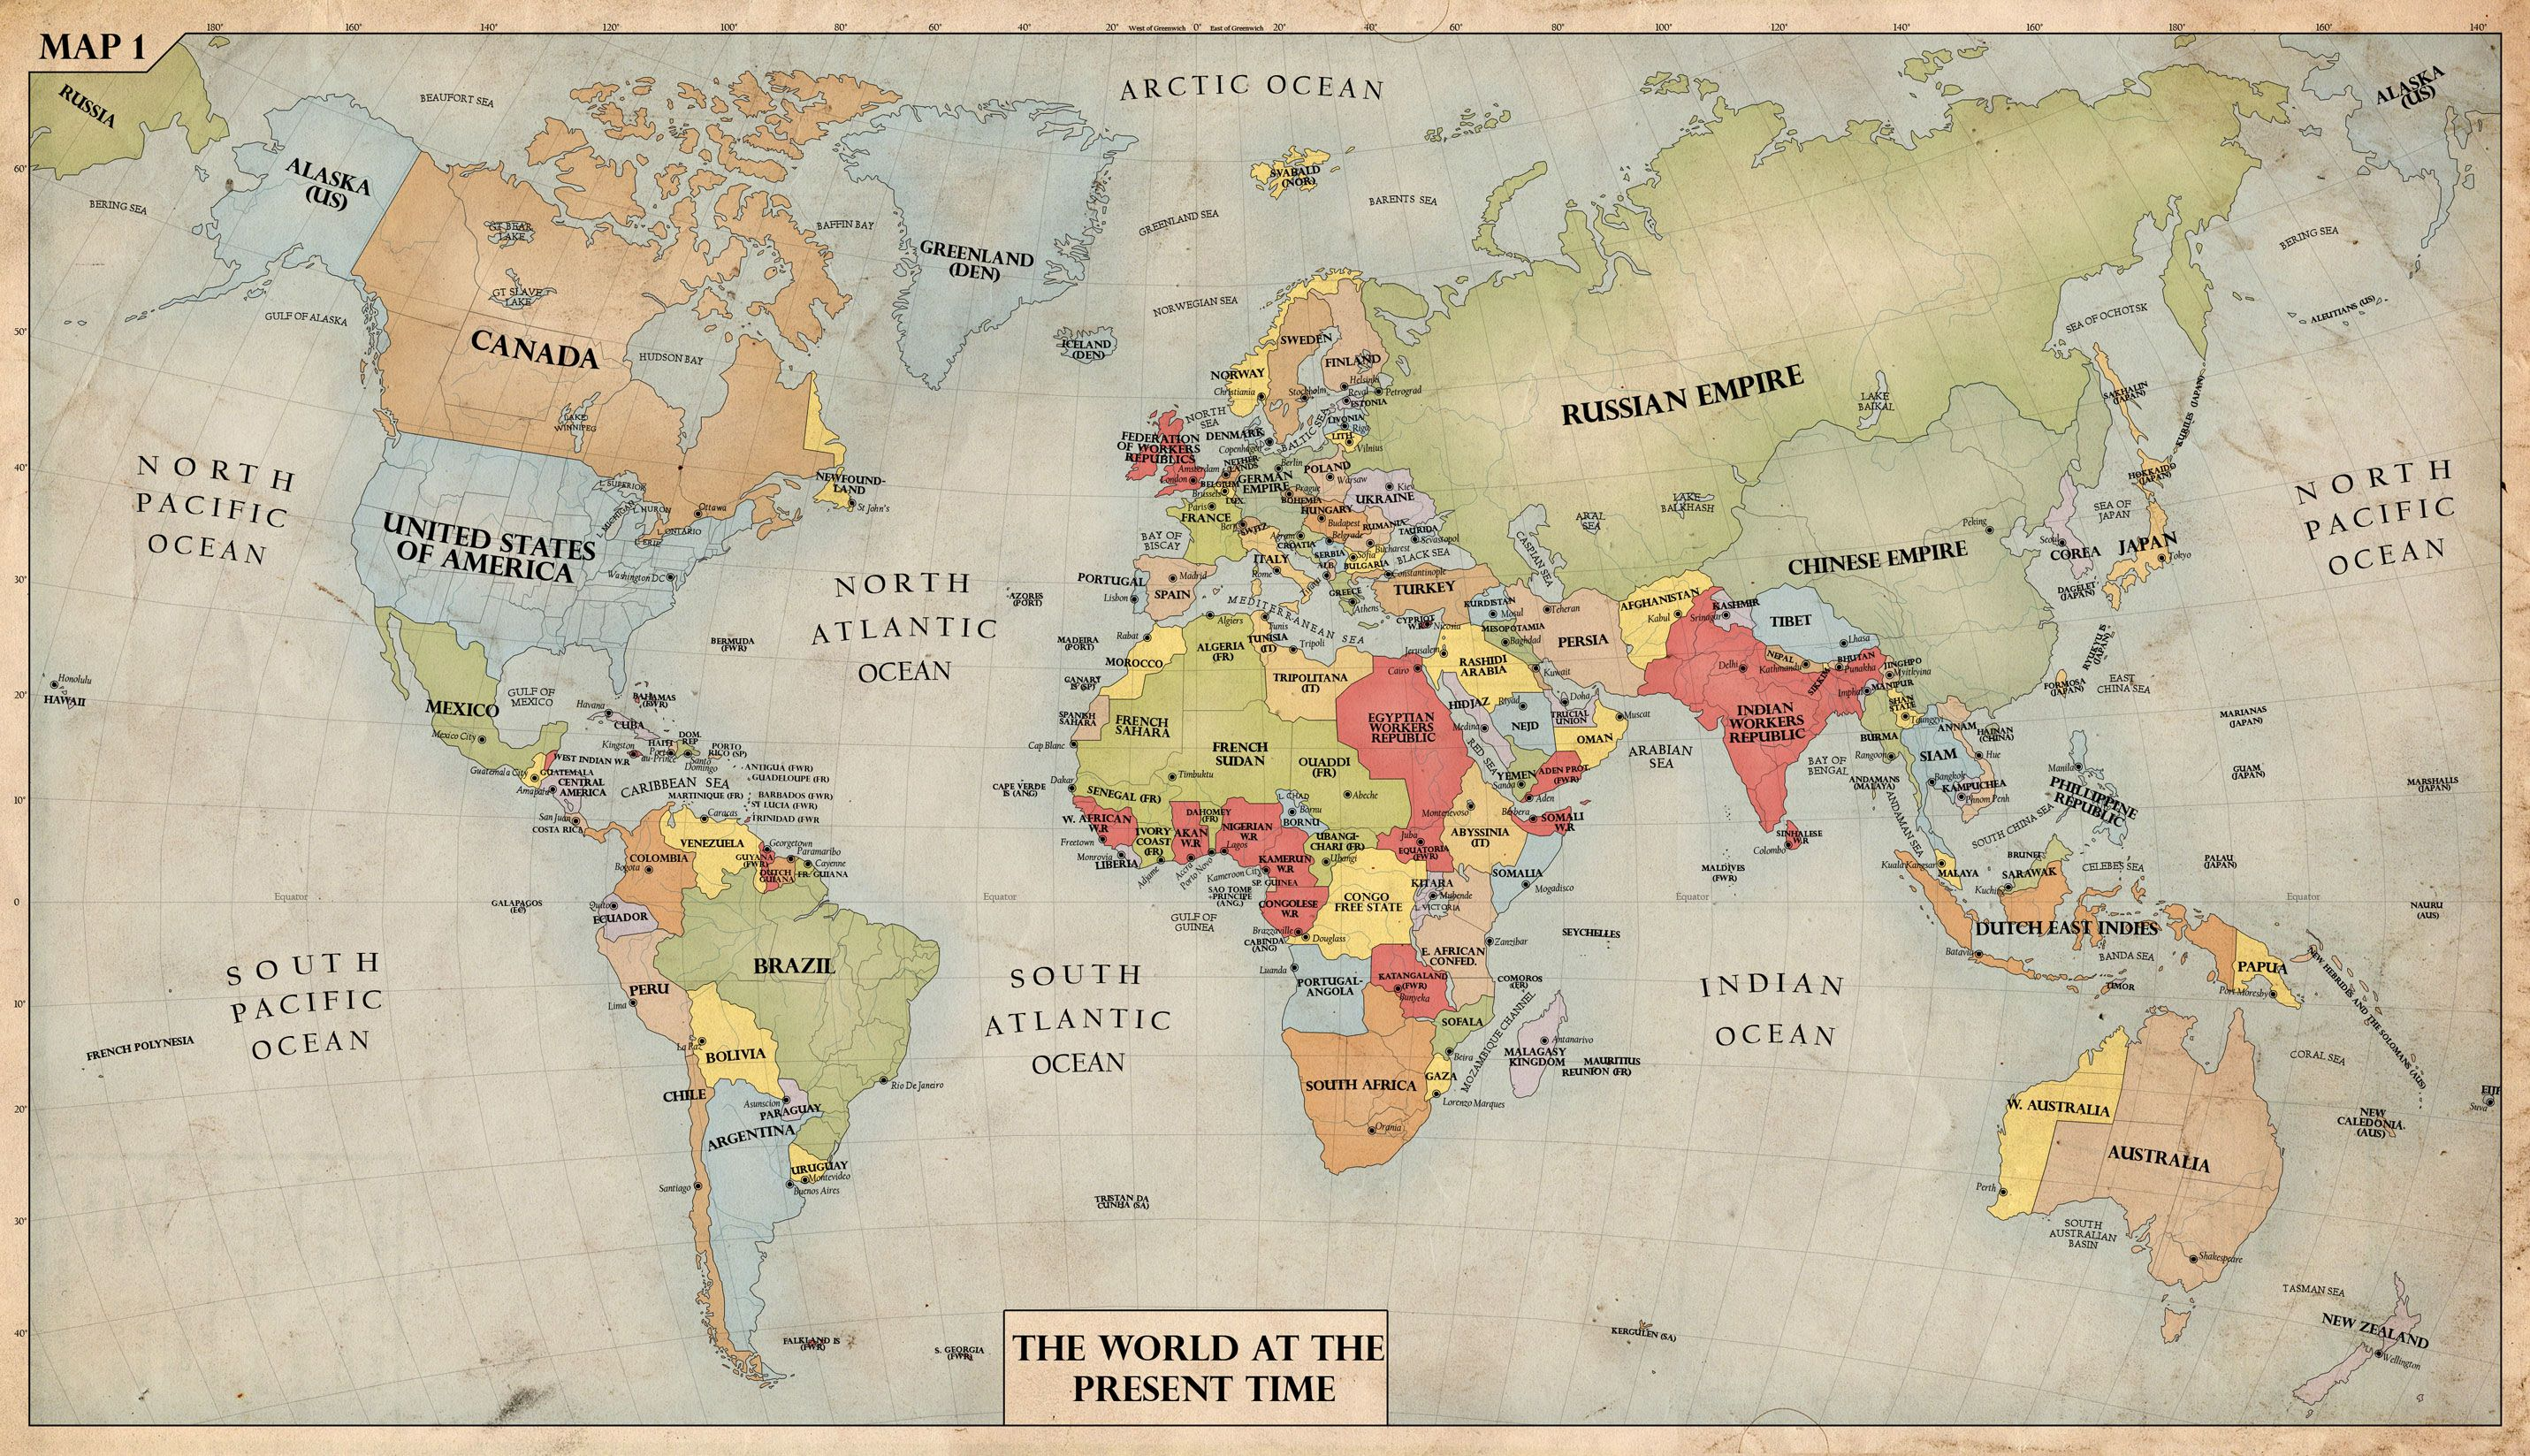 Awesome World Map 1940 1 | Map, Vintage world maps ...